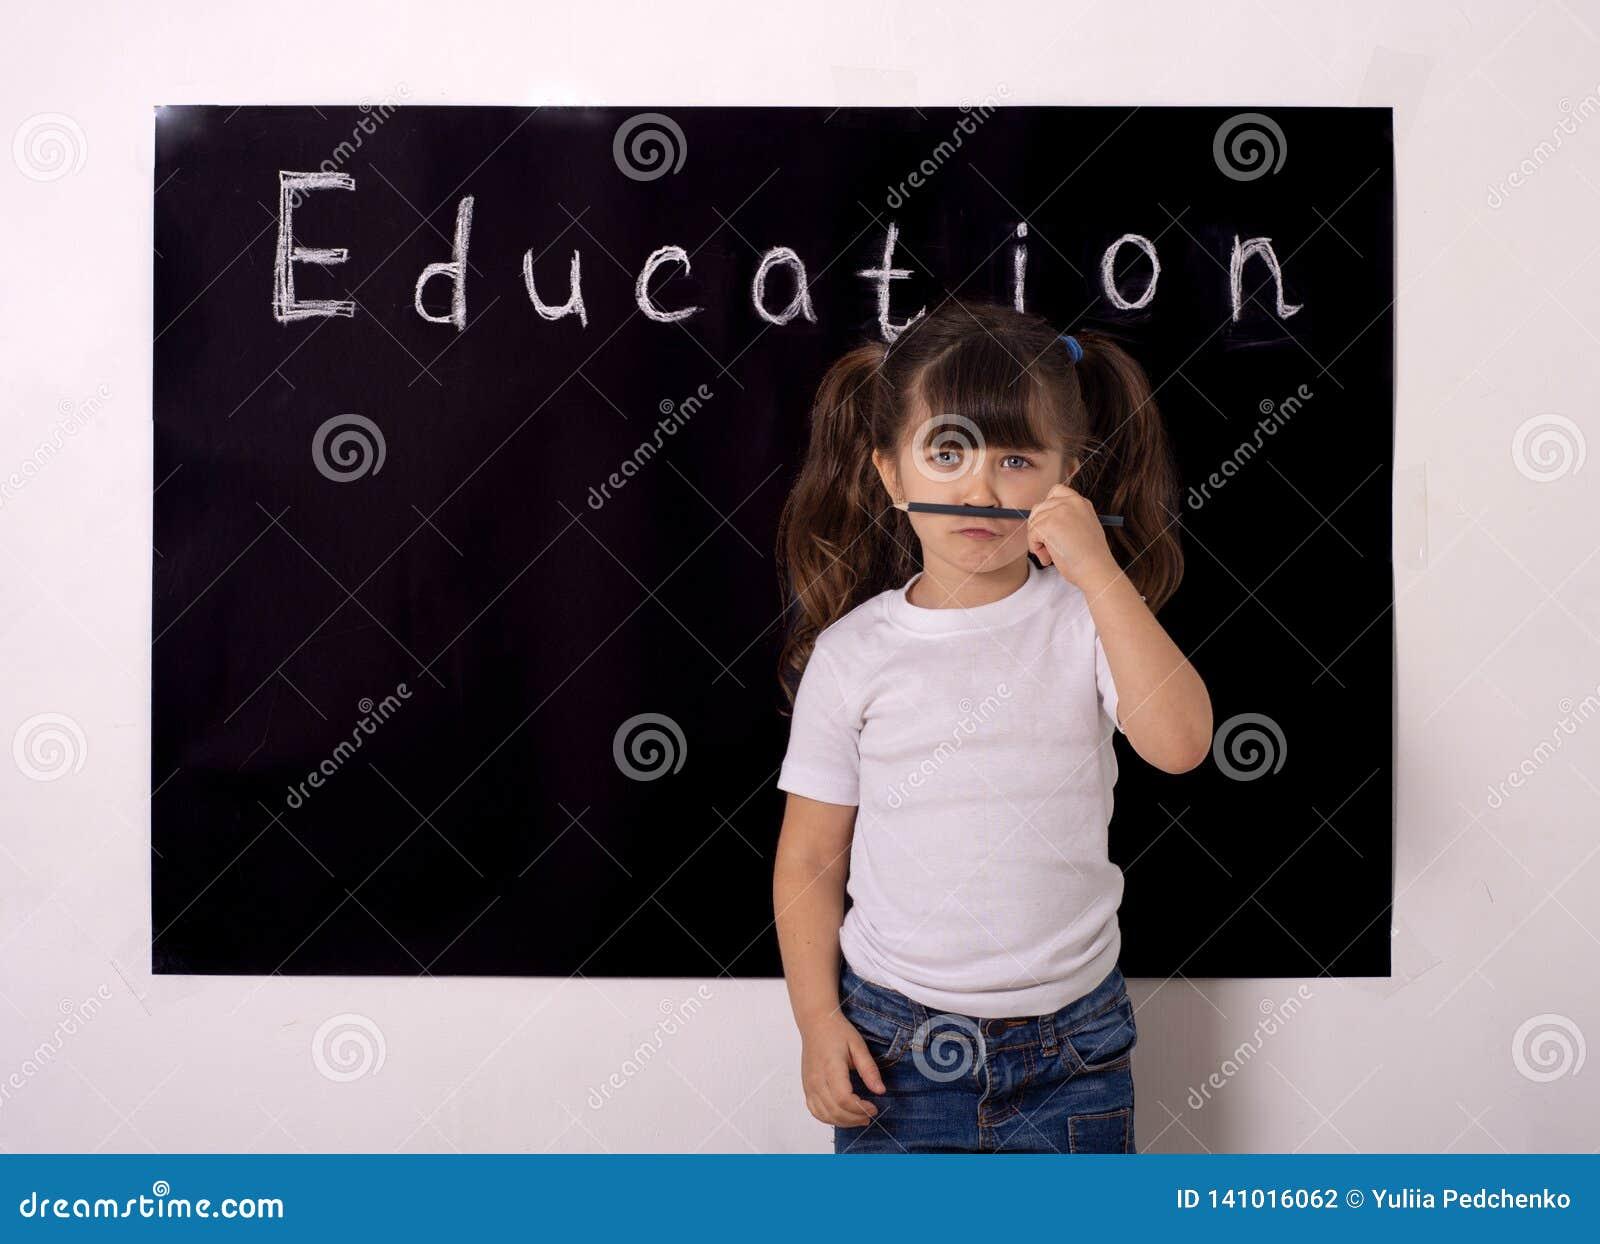 Science technology engineering maths STEM education concept. School girl kid